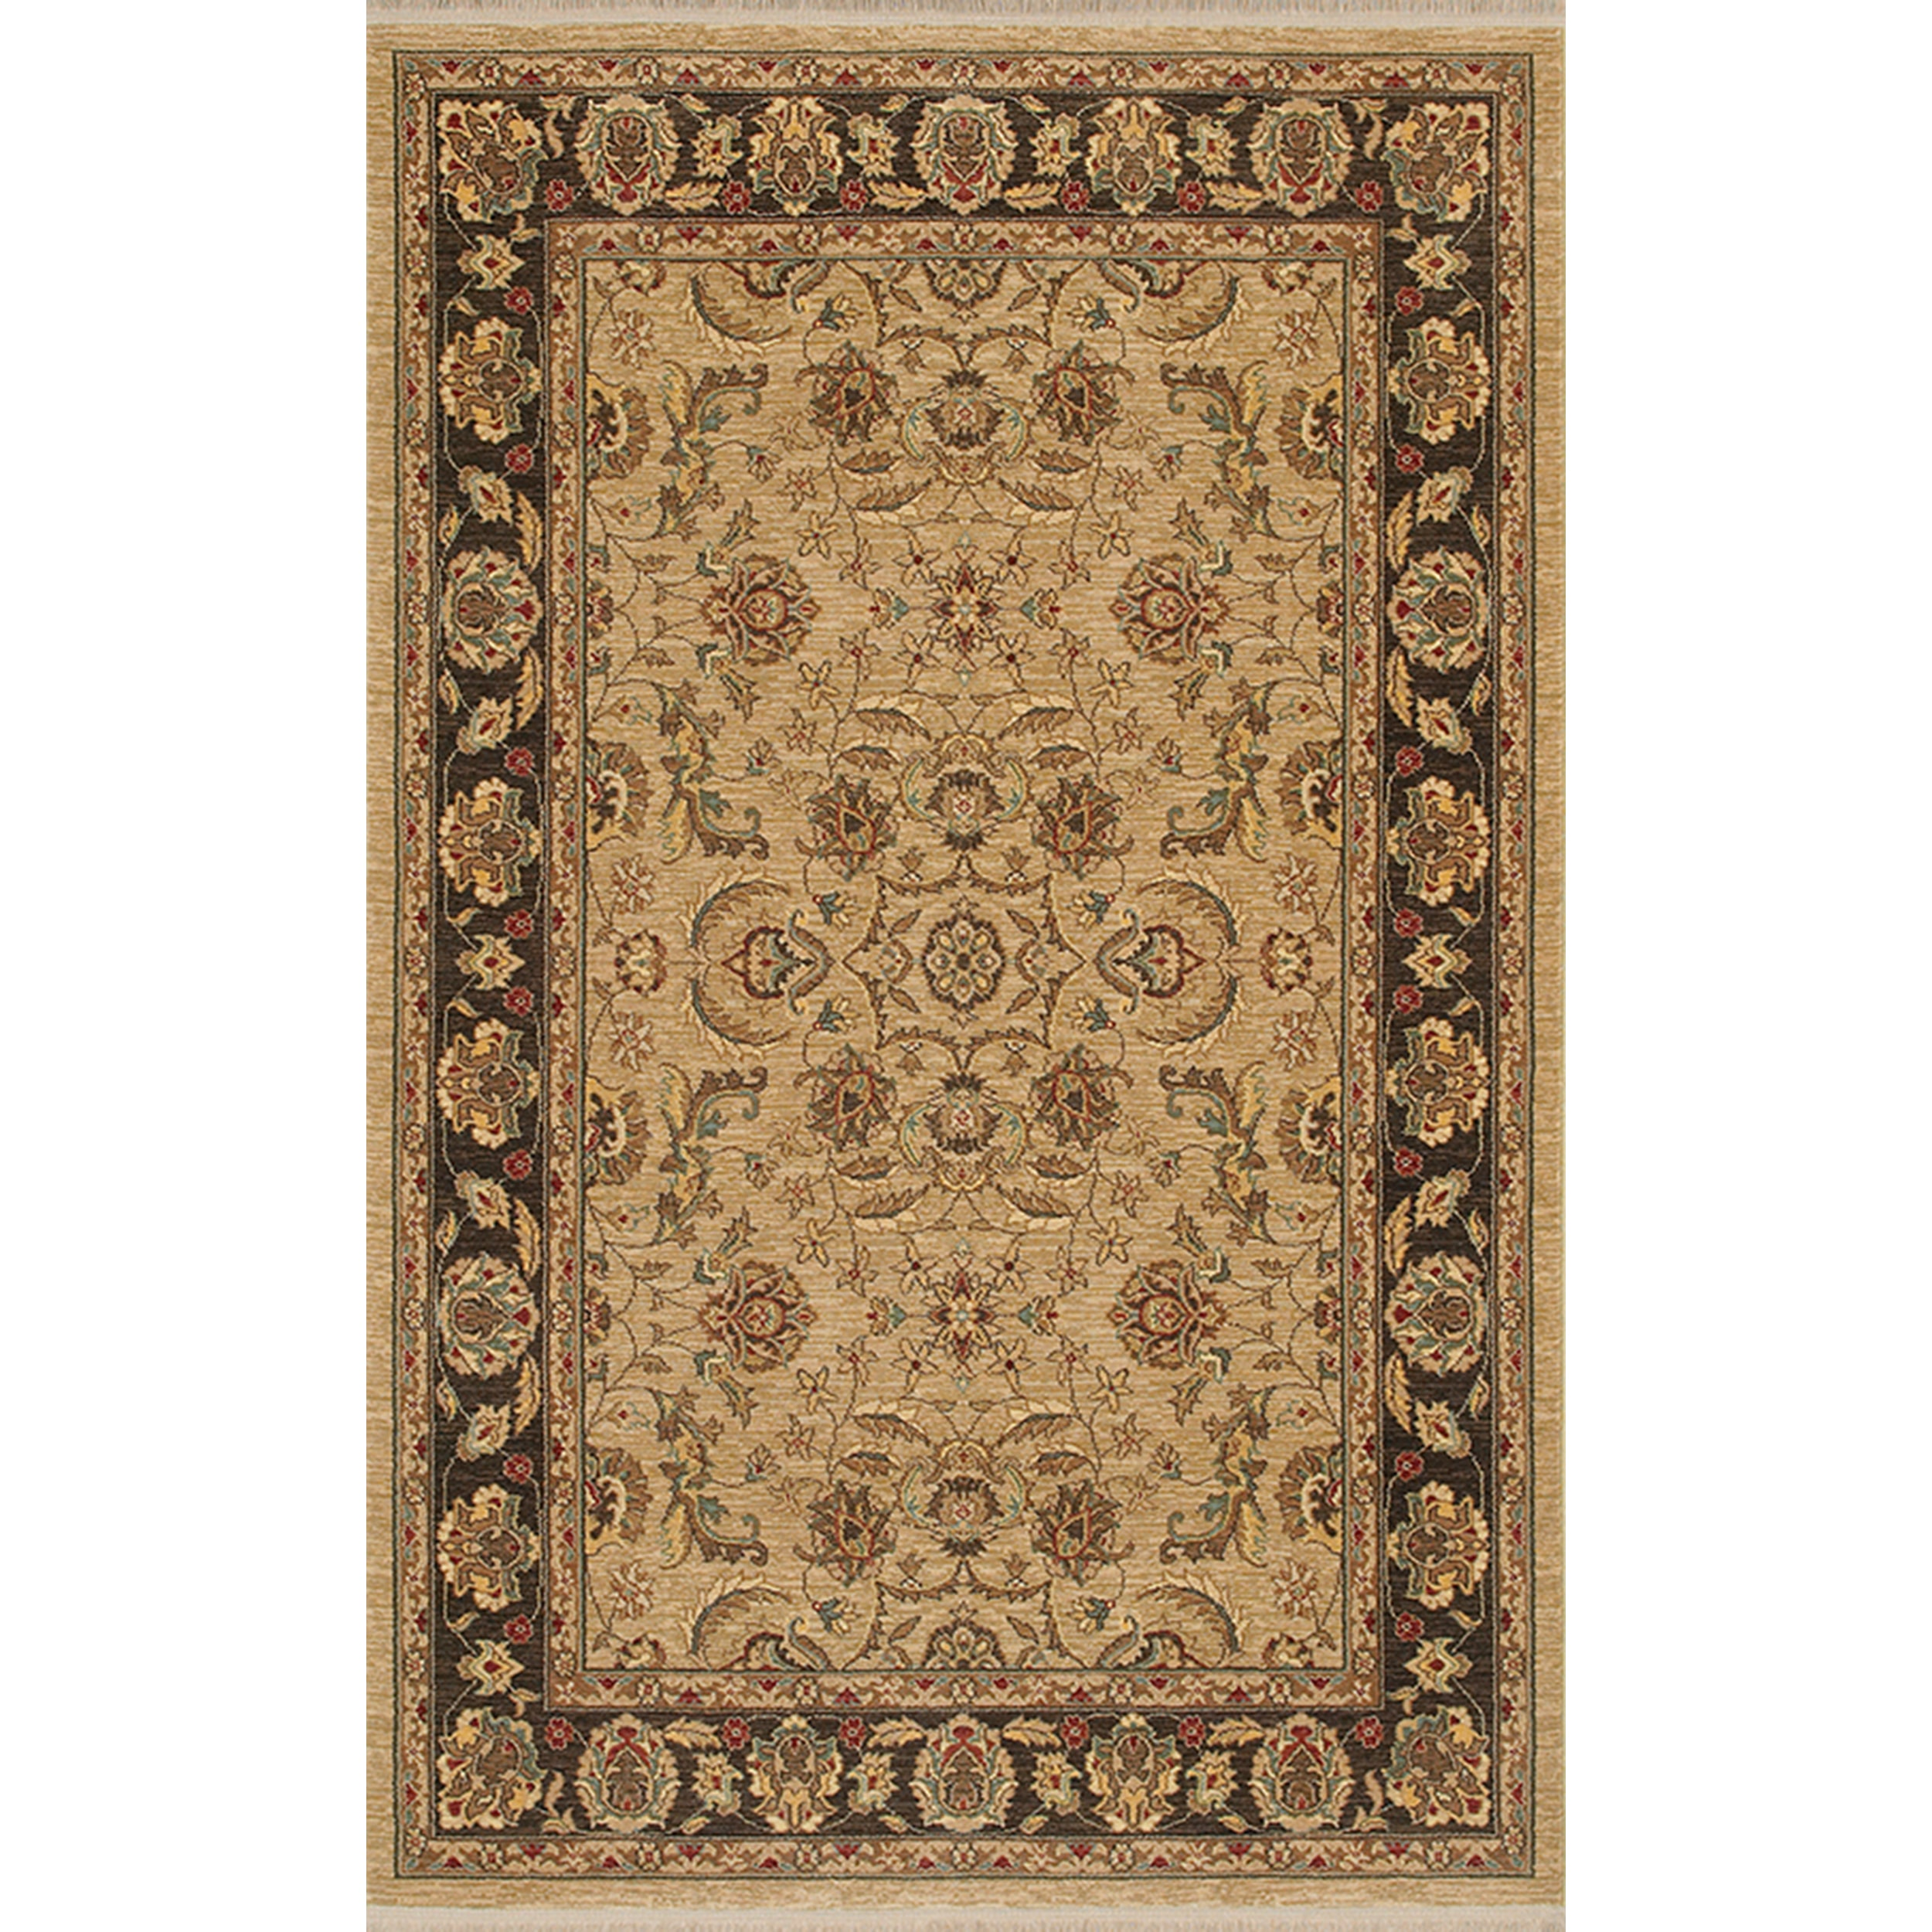 Karastan Ashara Toscano Area Rug by Mohawk Carpet Distribution LP